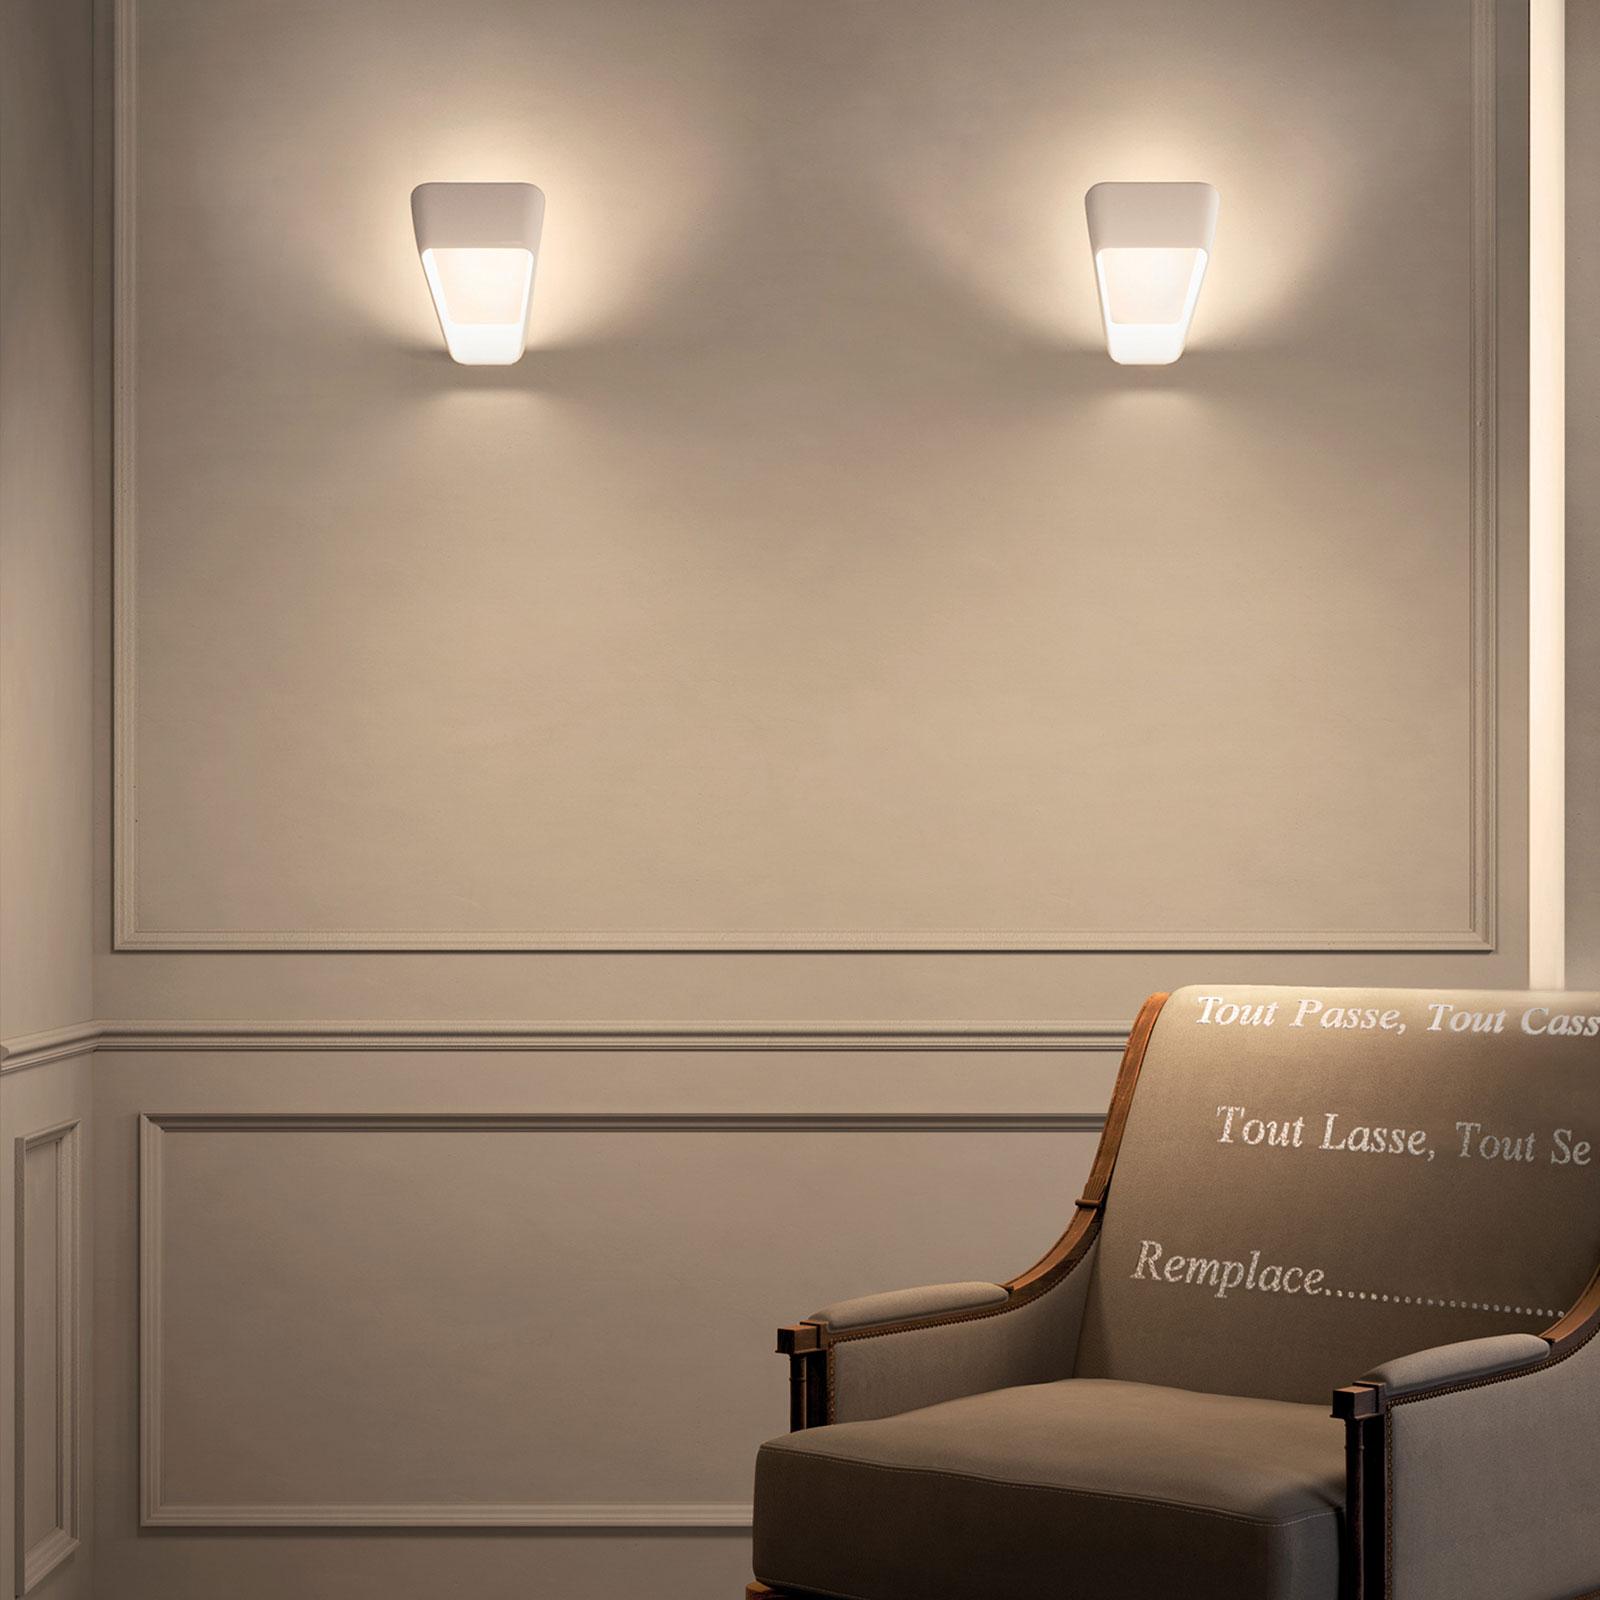 Acquista Kundalini Frame applique LED, bianca